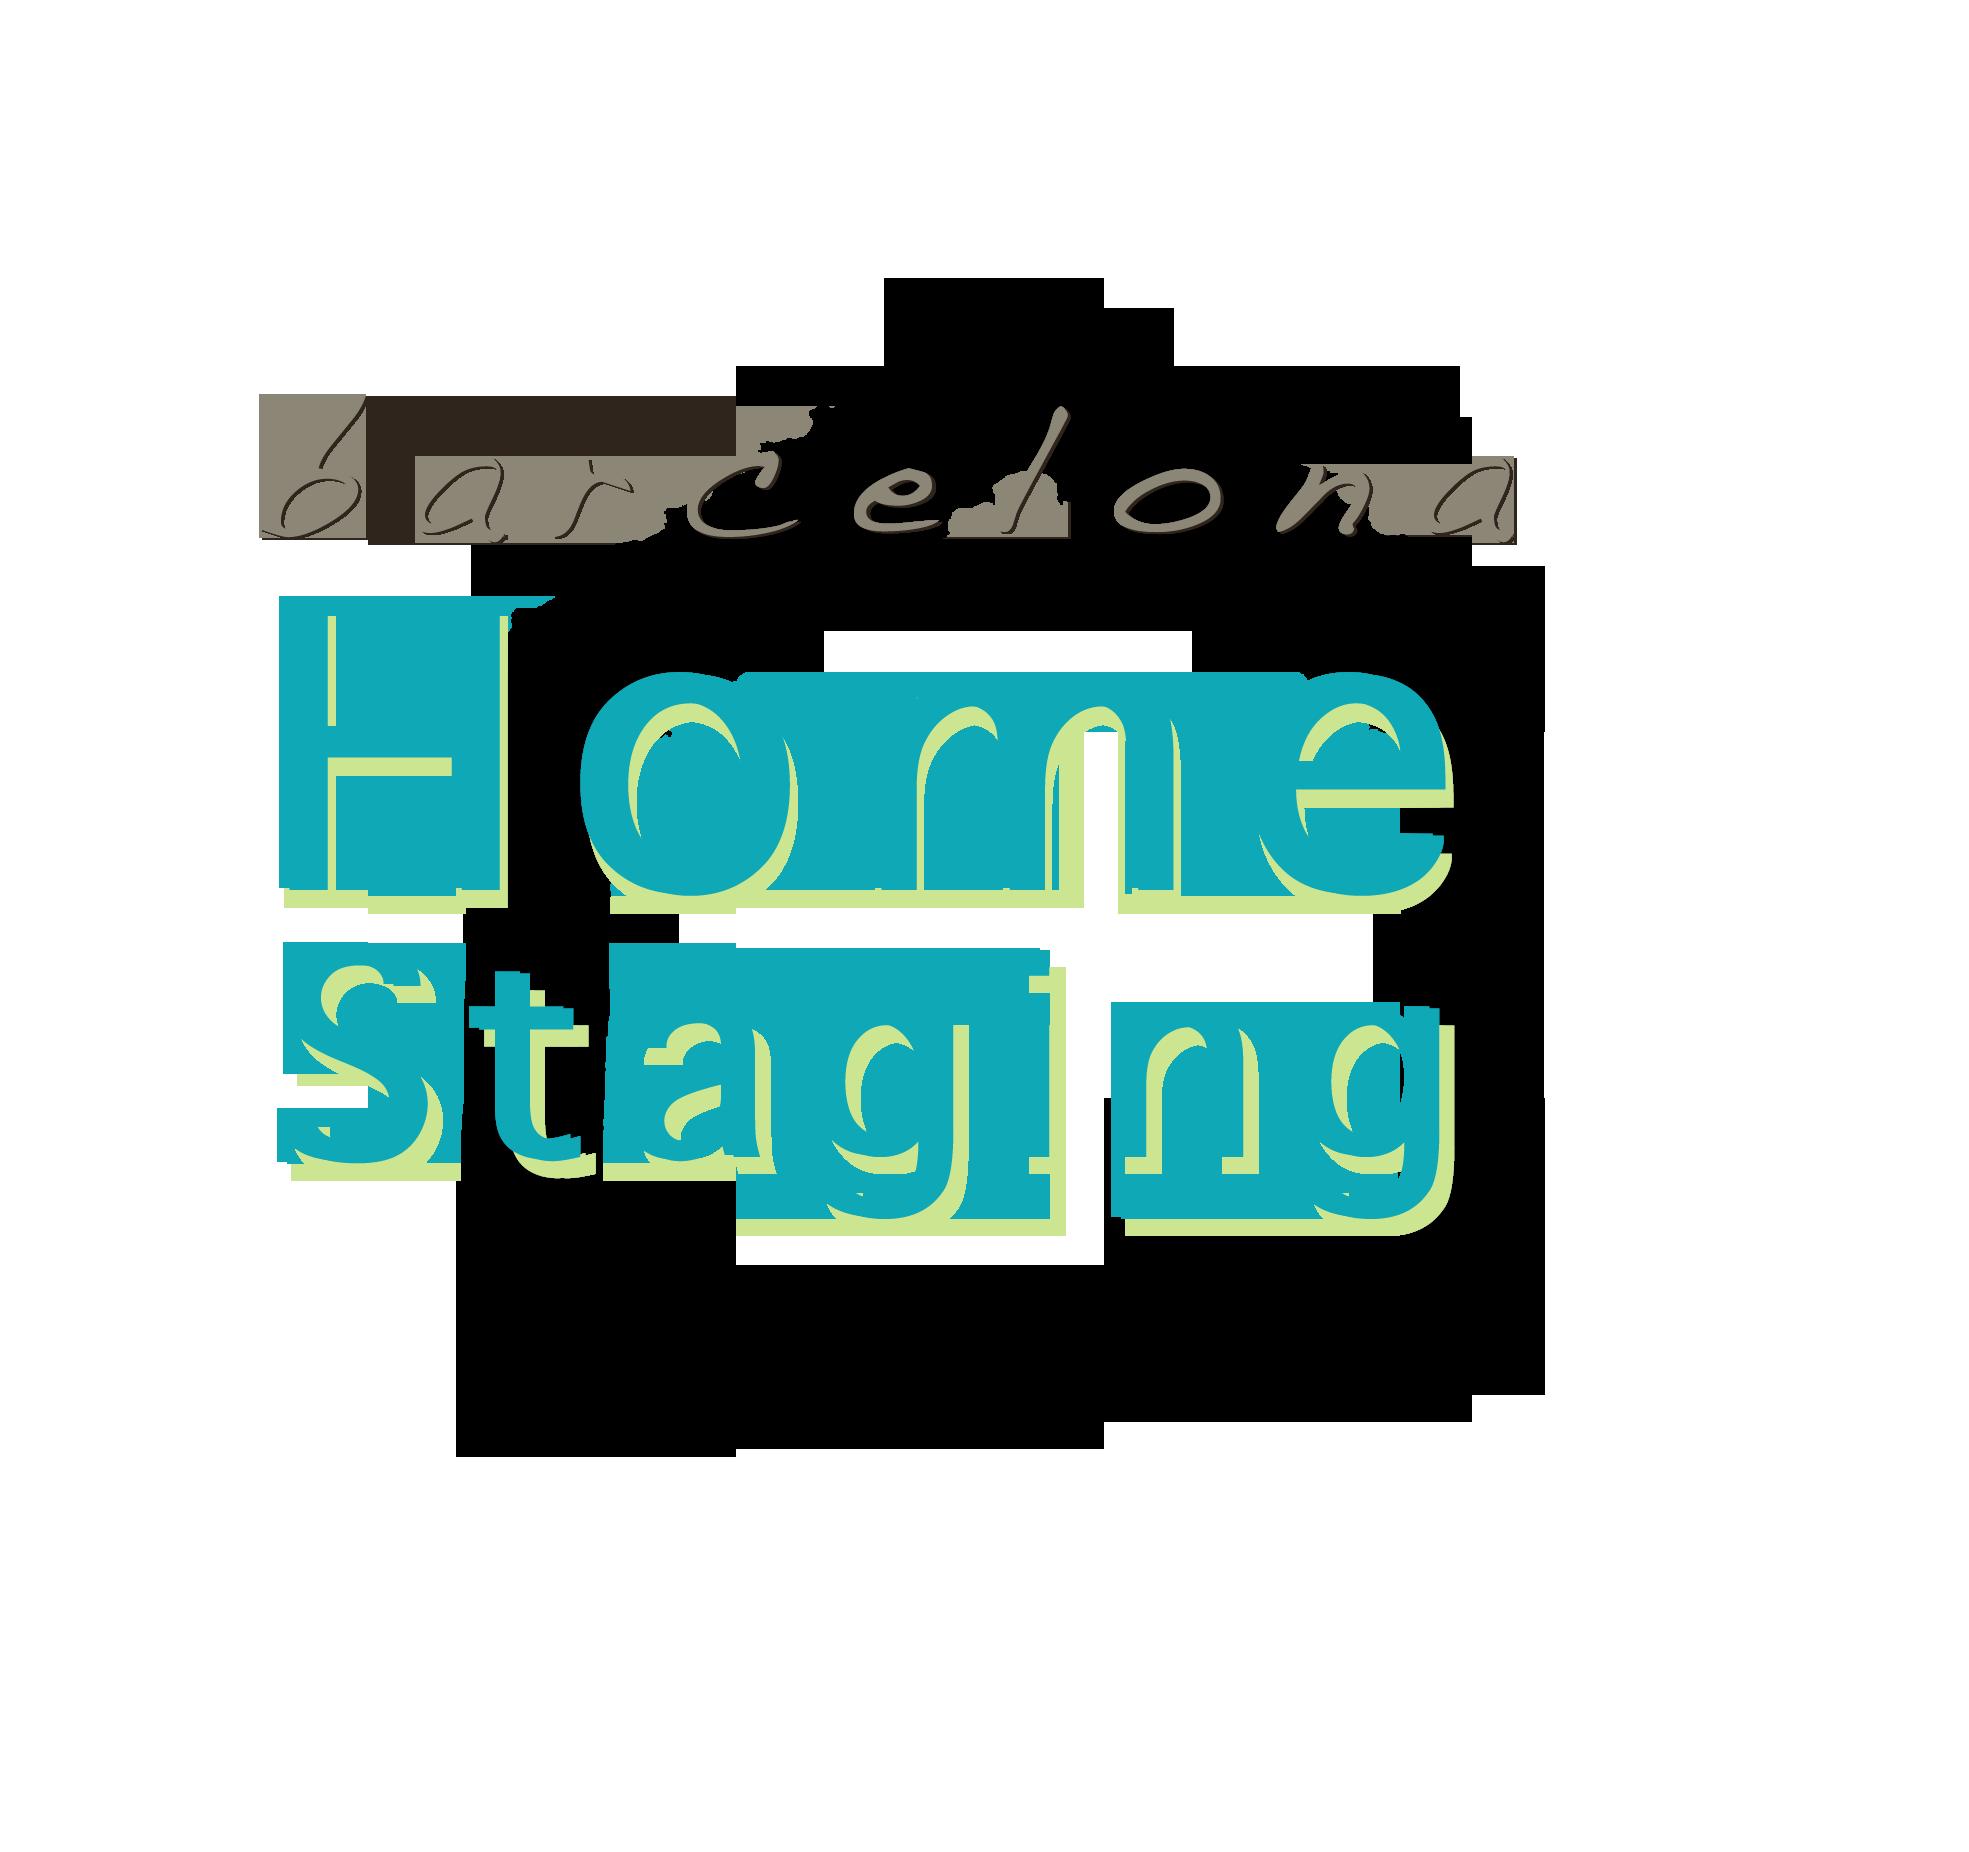 Asociaci n home staging espa a comunidad valenciana - Home staging valencia ...